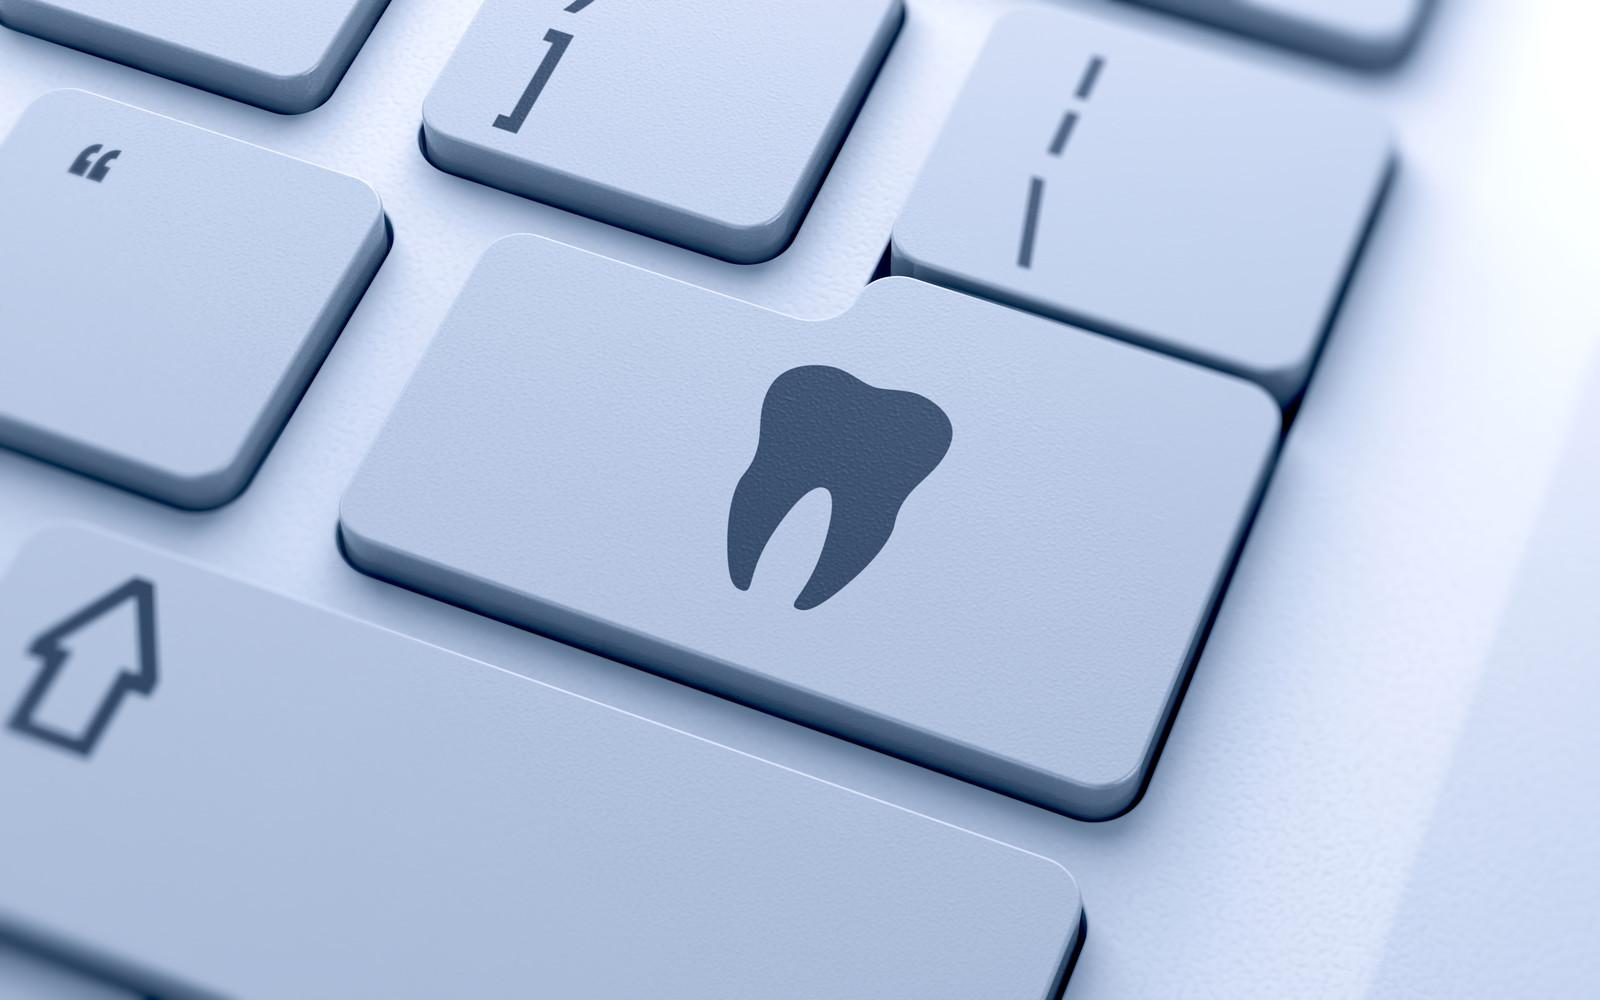 نرمافزار مطب دندانپزشکی